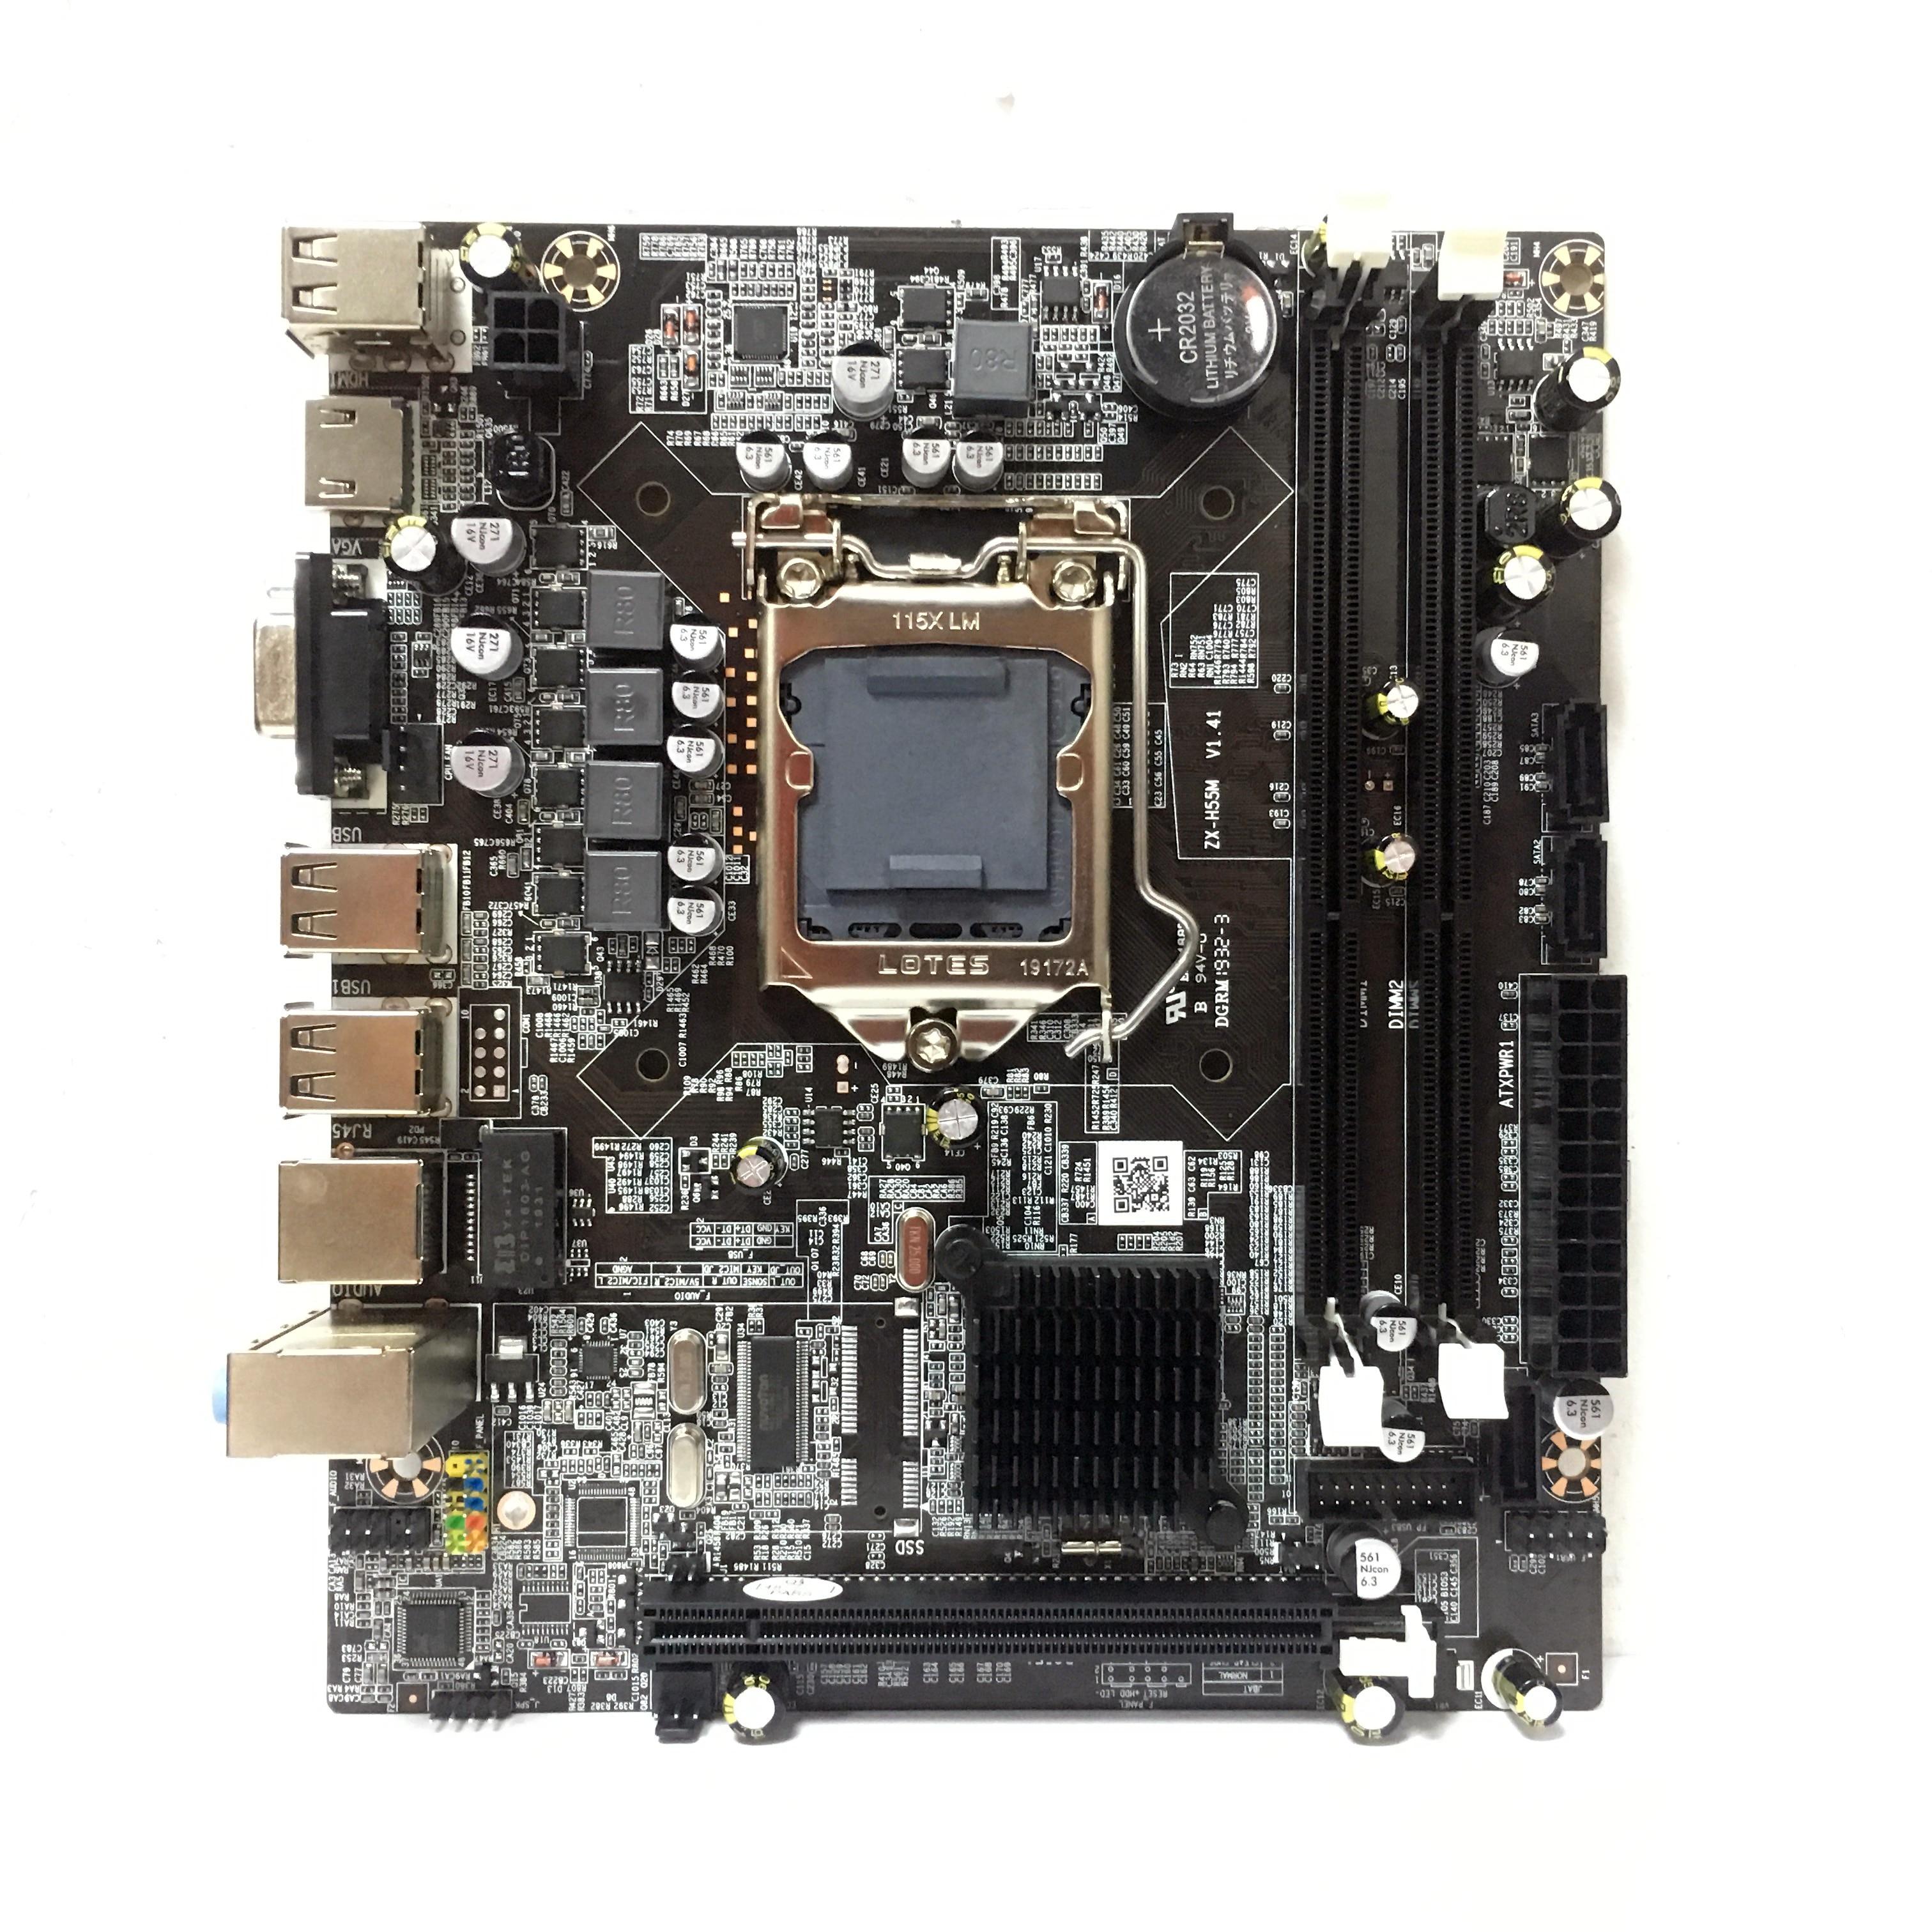 Intel Chipset  H55 PC LGA1156 Computer Desktop Motherboard DDR3 Double USB 2.0  LGA 1156 Motherboard